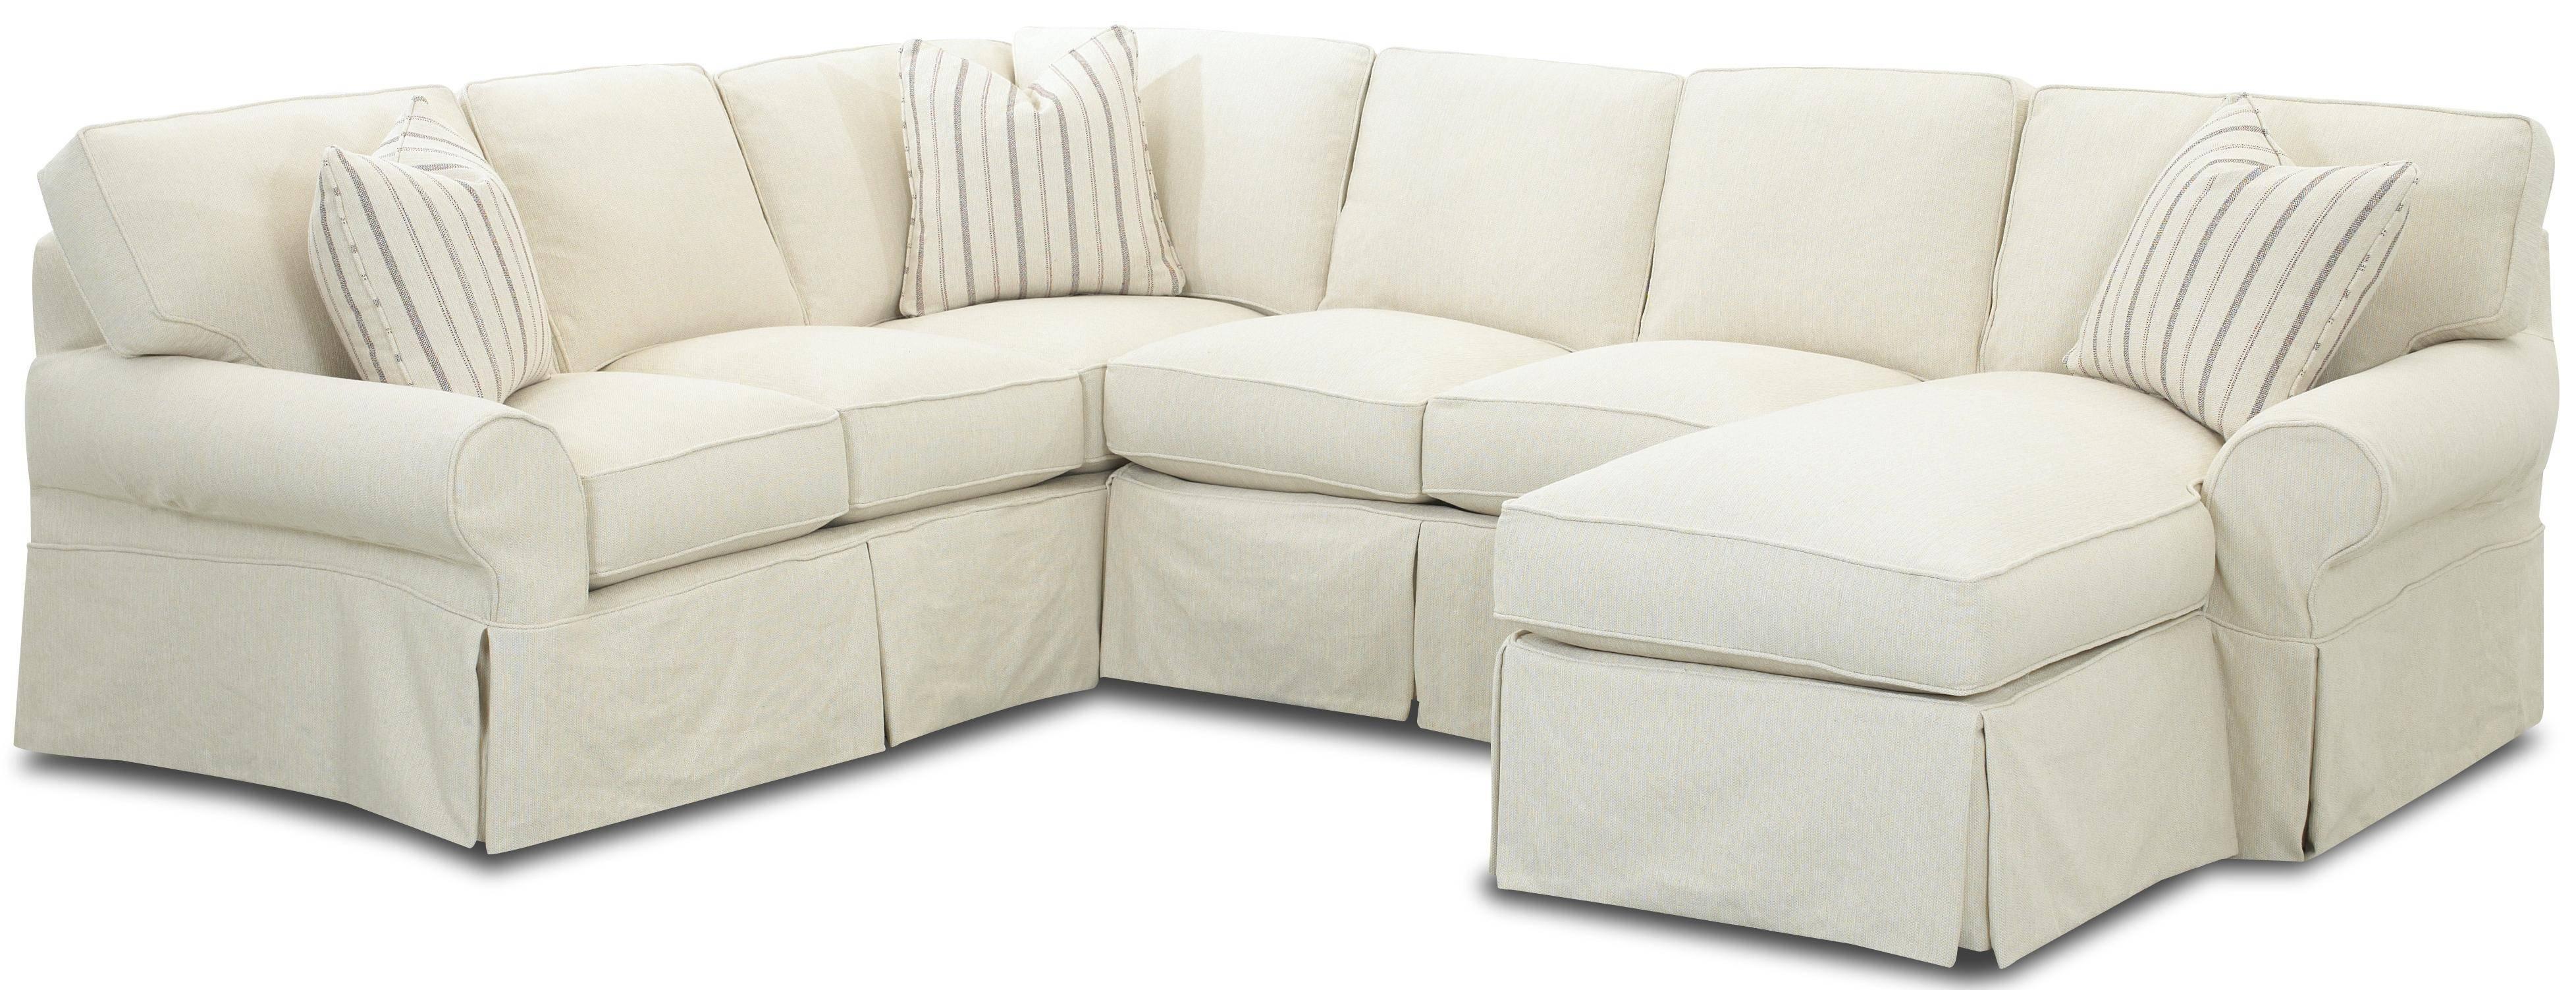 Furniture: Inspirational Slipcover Sectional Sofa For Modern intended for Sleeper Sofa Slipcovers (Image 6 of 15)